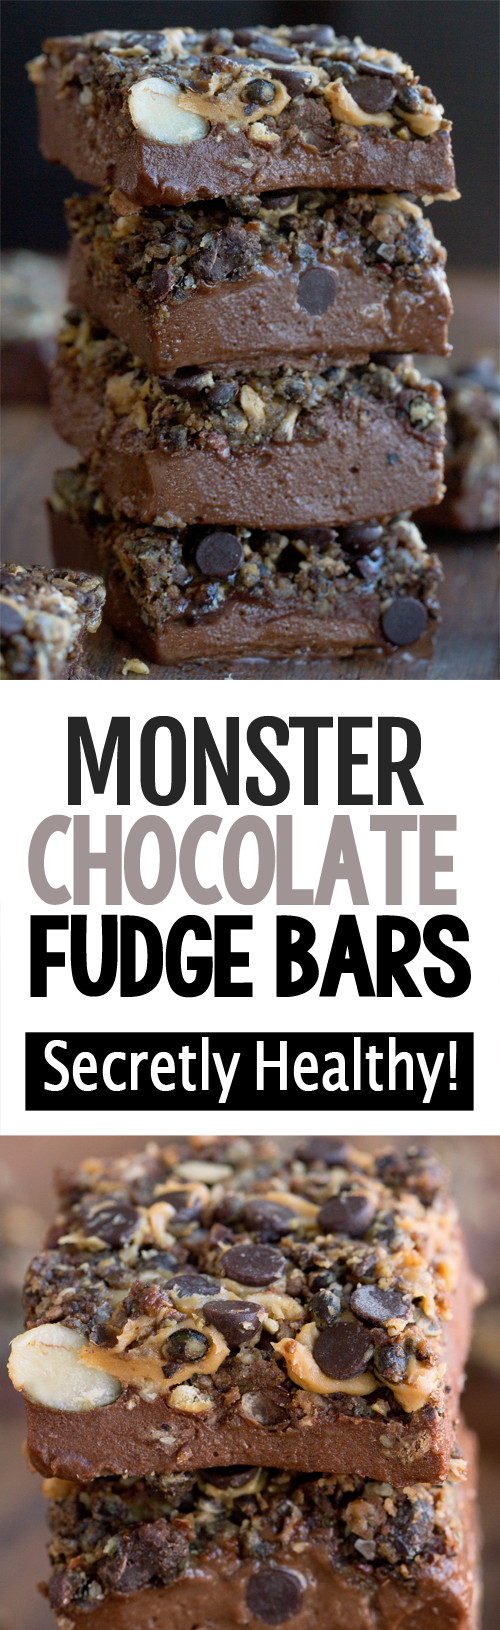 Secretly Healthy Monster Chocolate Fudge Bars